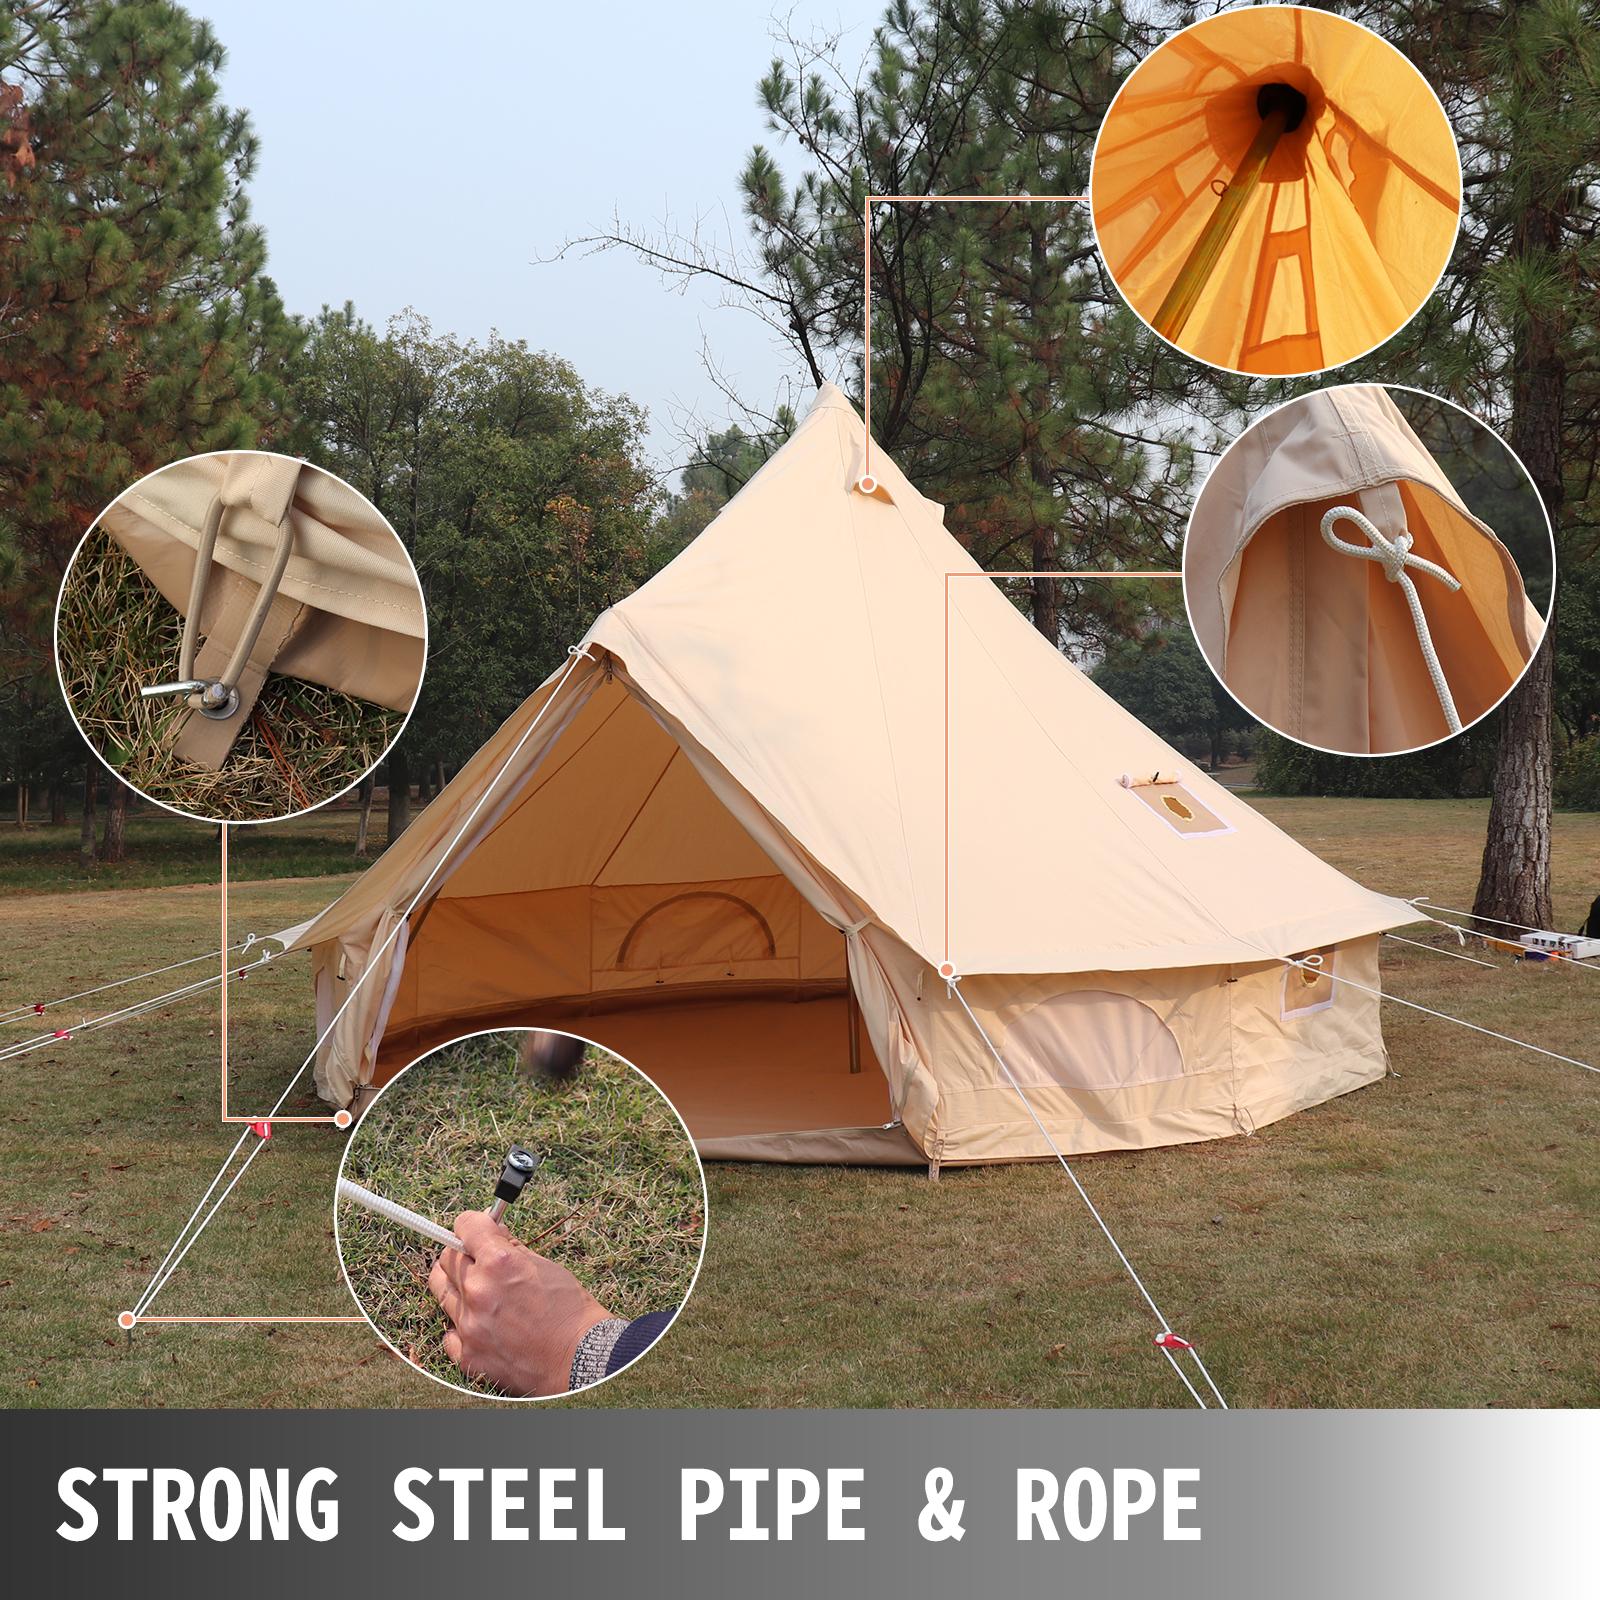 4-Season-Bell-Tent-3-4-5-6M-Waterproof-Cotton-Canvas-Glamping-Camping-Beach-US thumbnail 41